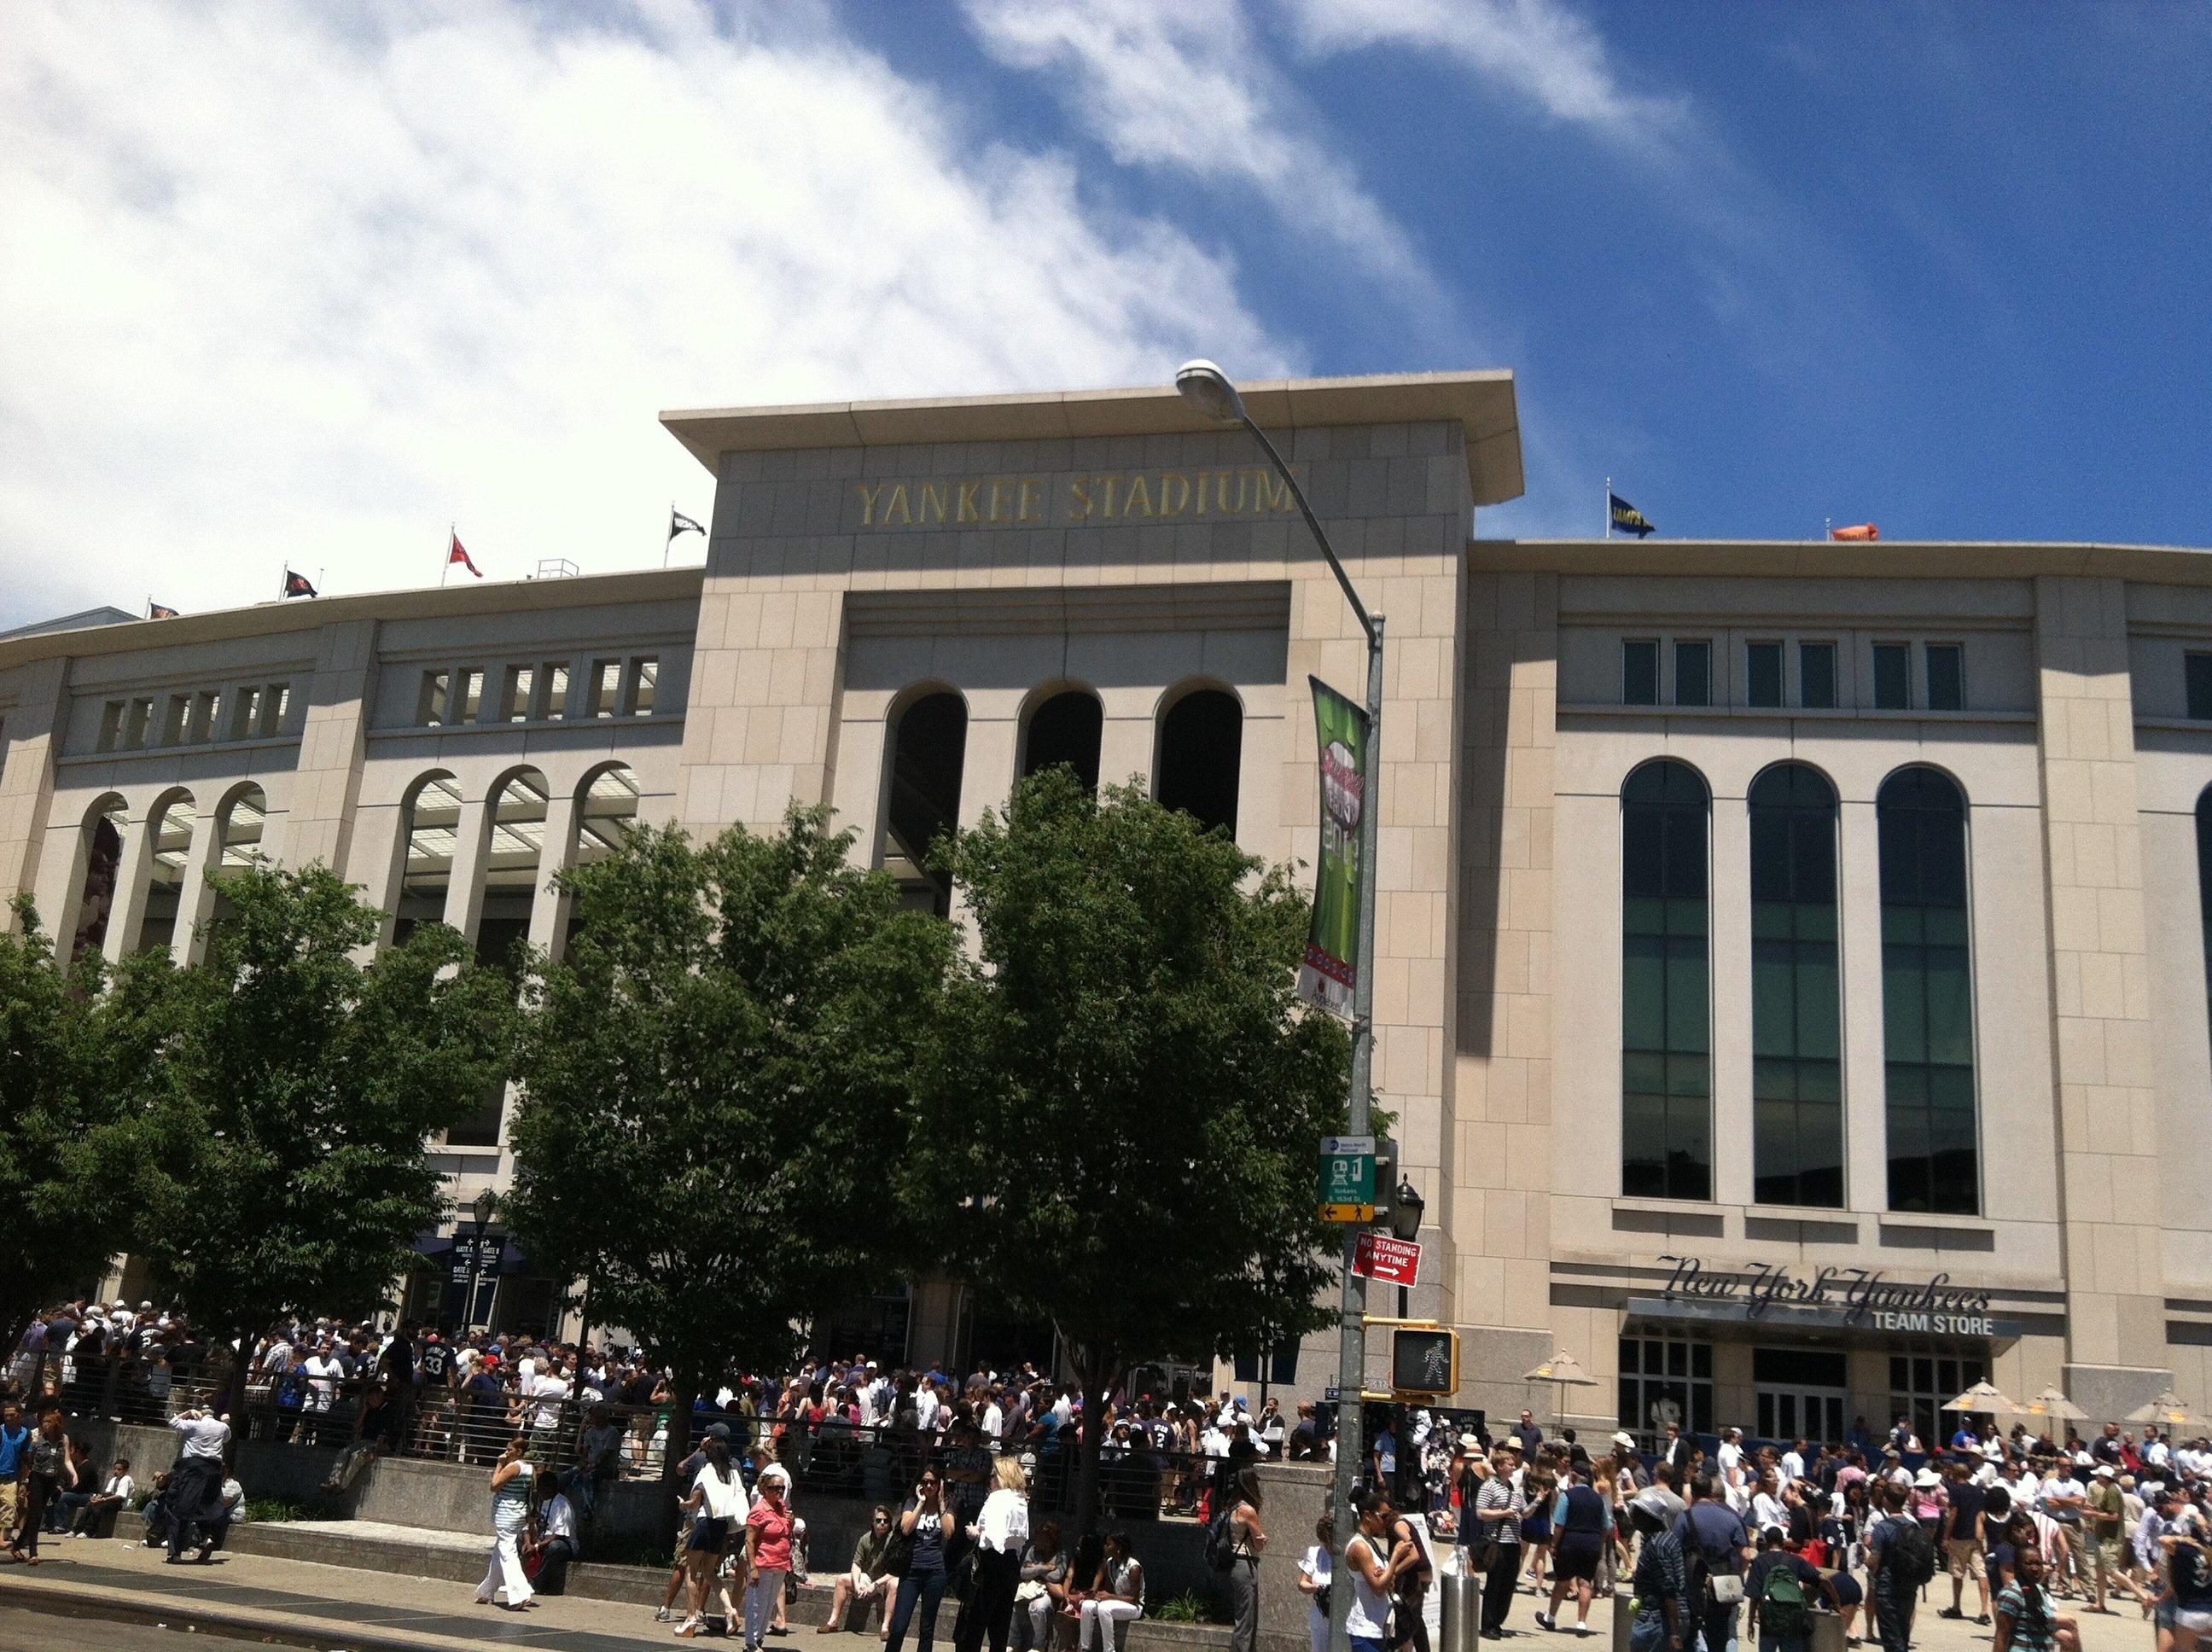 New York Yankees Parking Surplus Means Multimillion Dollar Loss